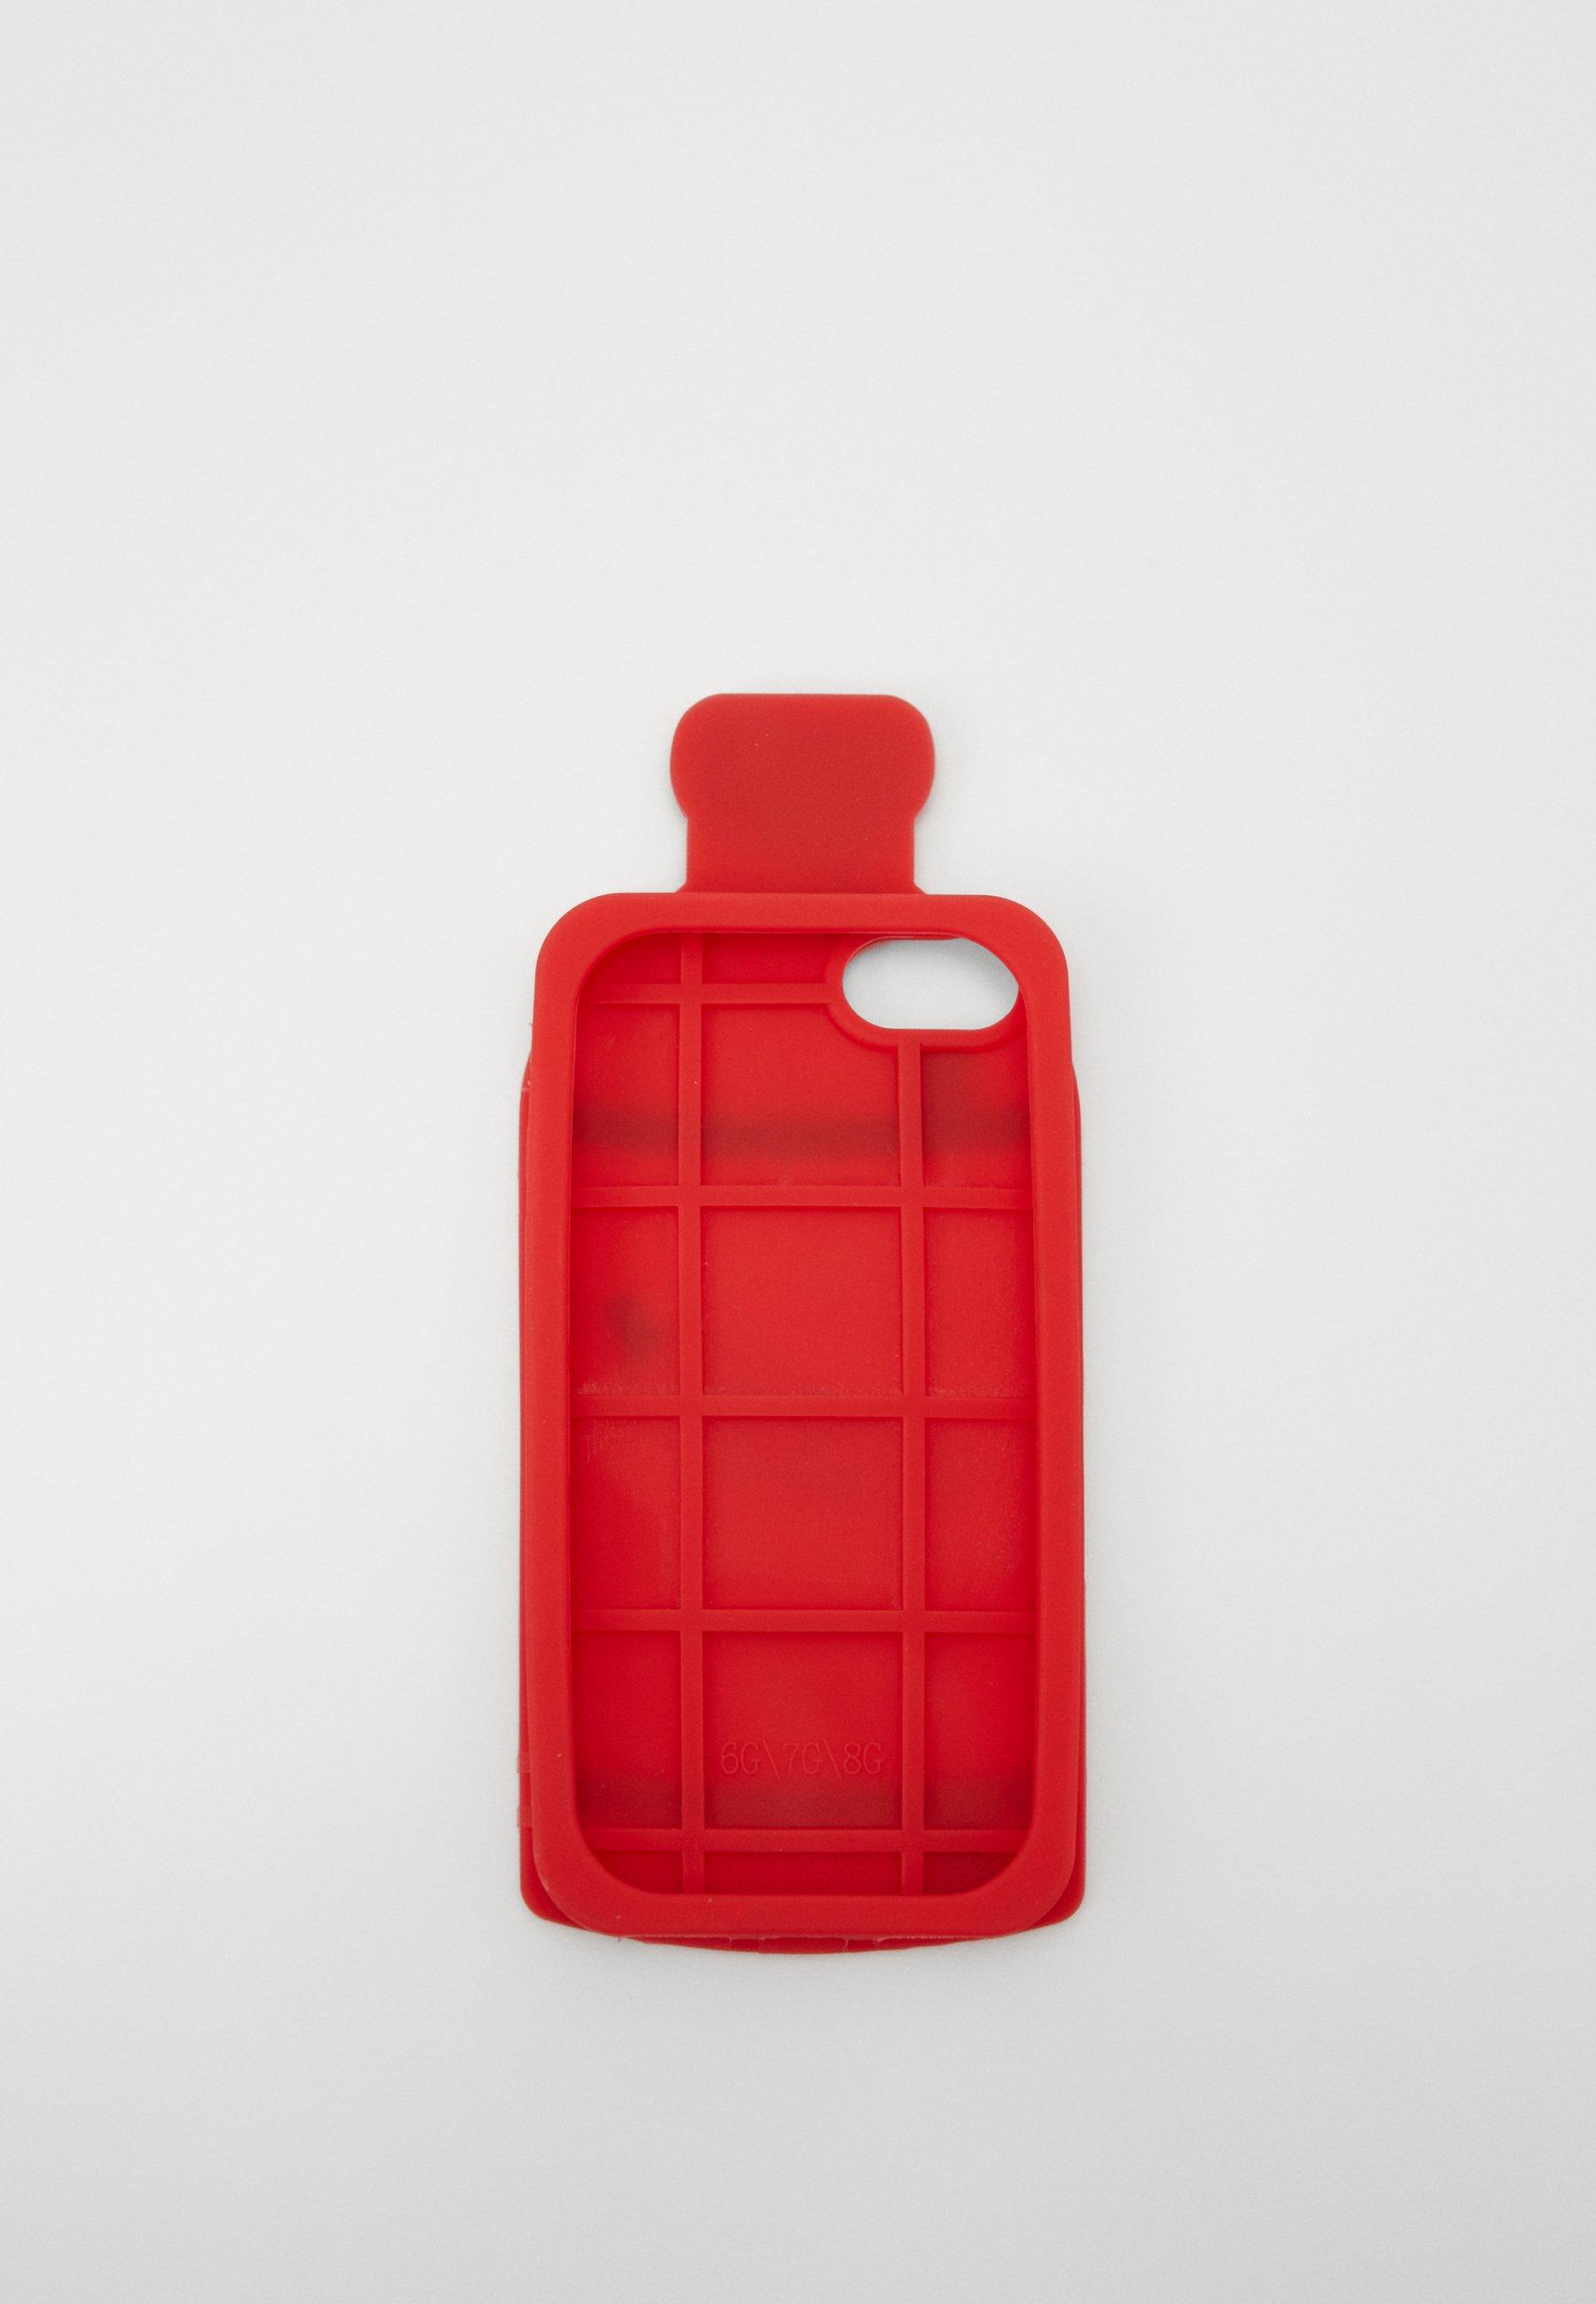 Mister Tee PHONECASE LOBSTER - Mobilveske - red/yellow/rød l3N8eYspd0RaWVM